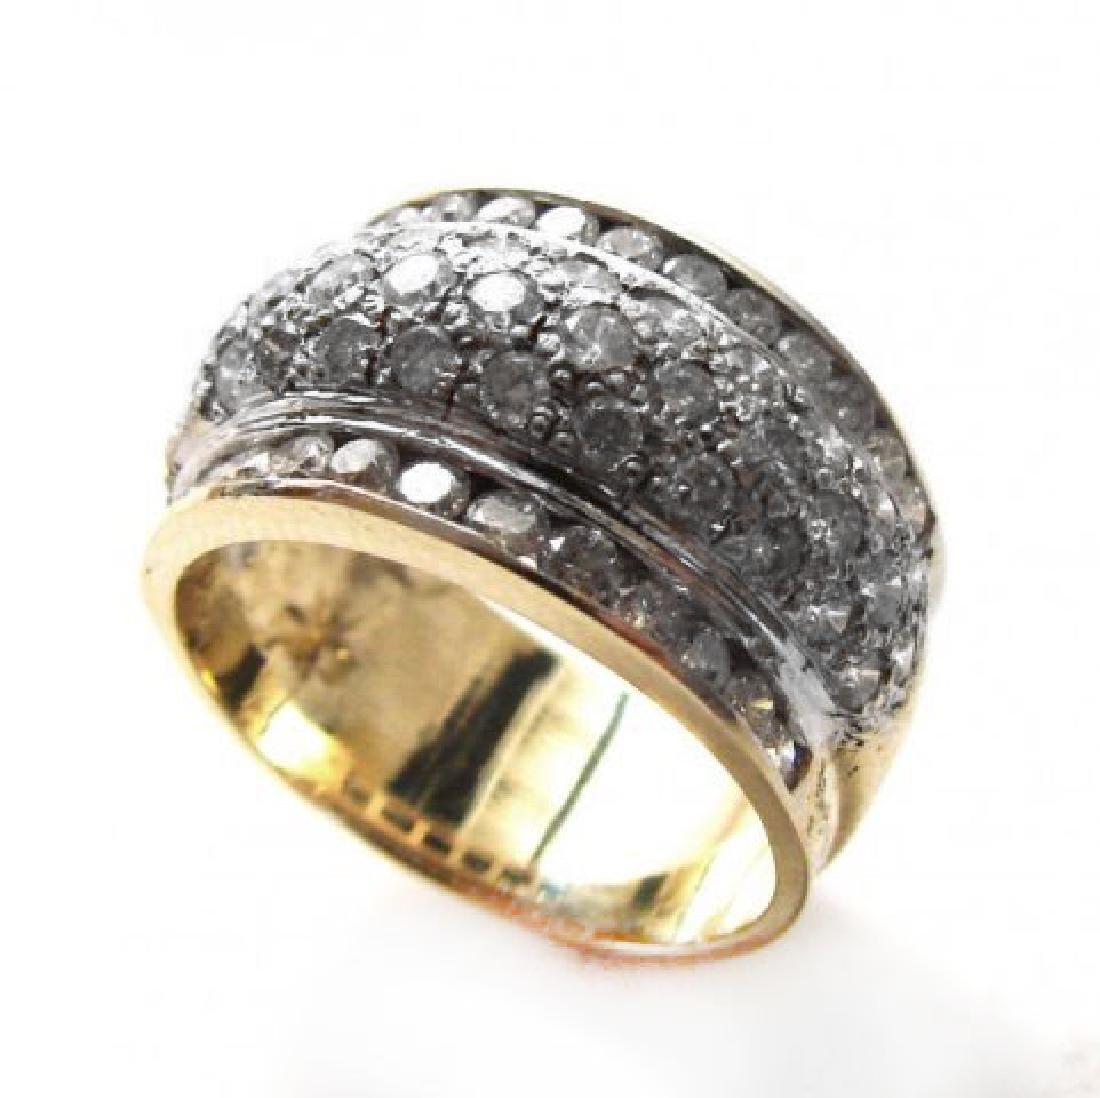 Woman's Diamond Ring 1.72Ct 14k Yellow Gold - 2